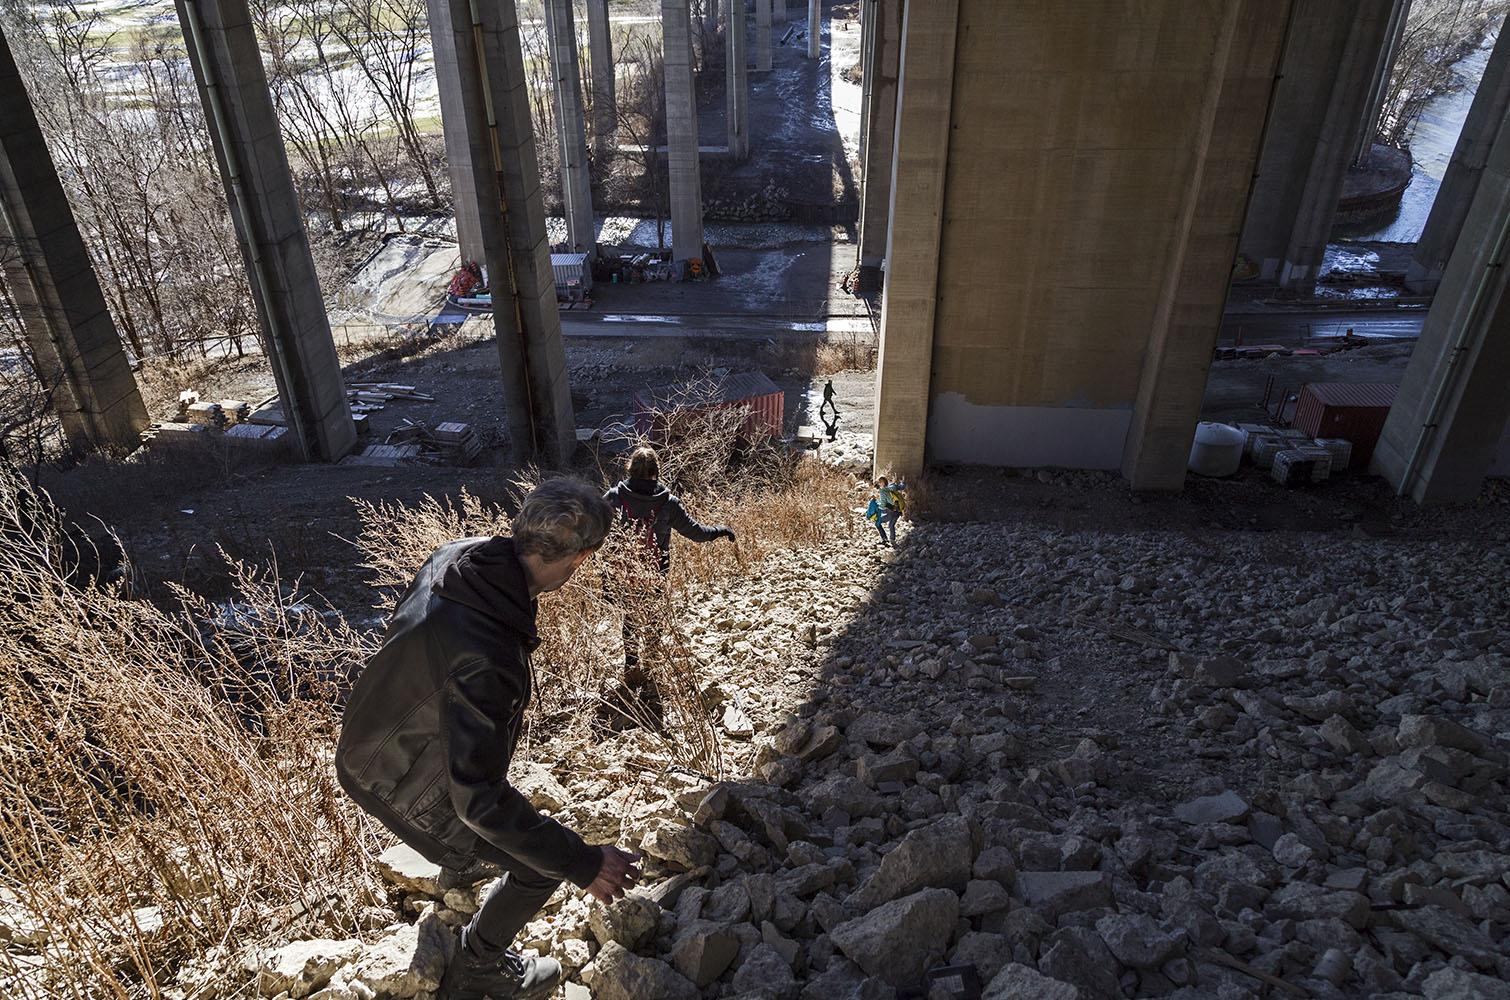 20170311. Expert urban explorers descend the steep concrete rubb